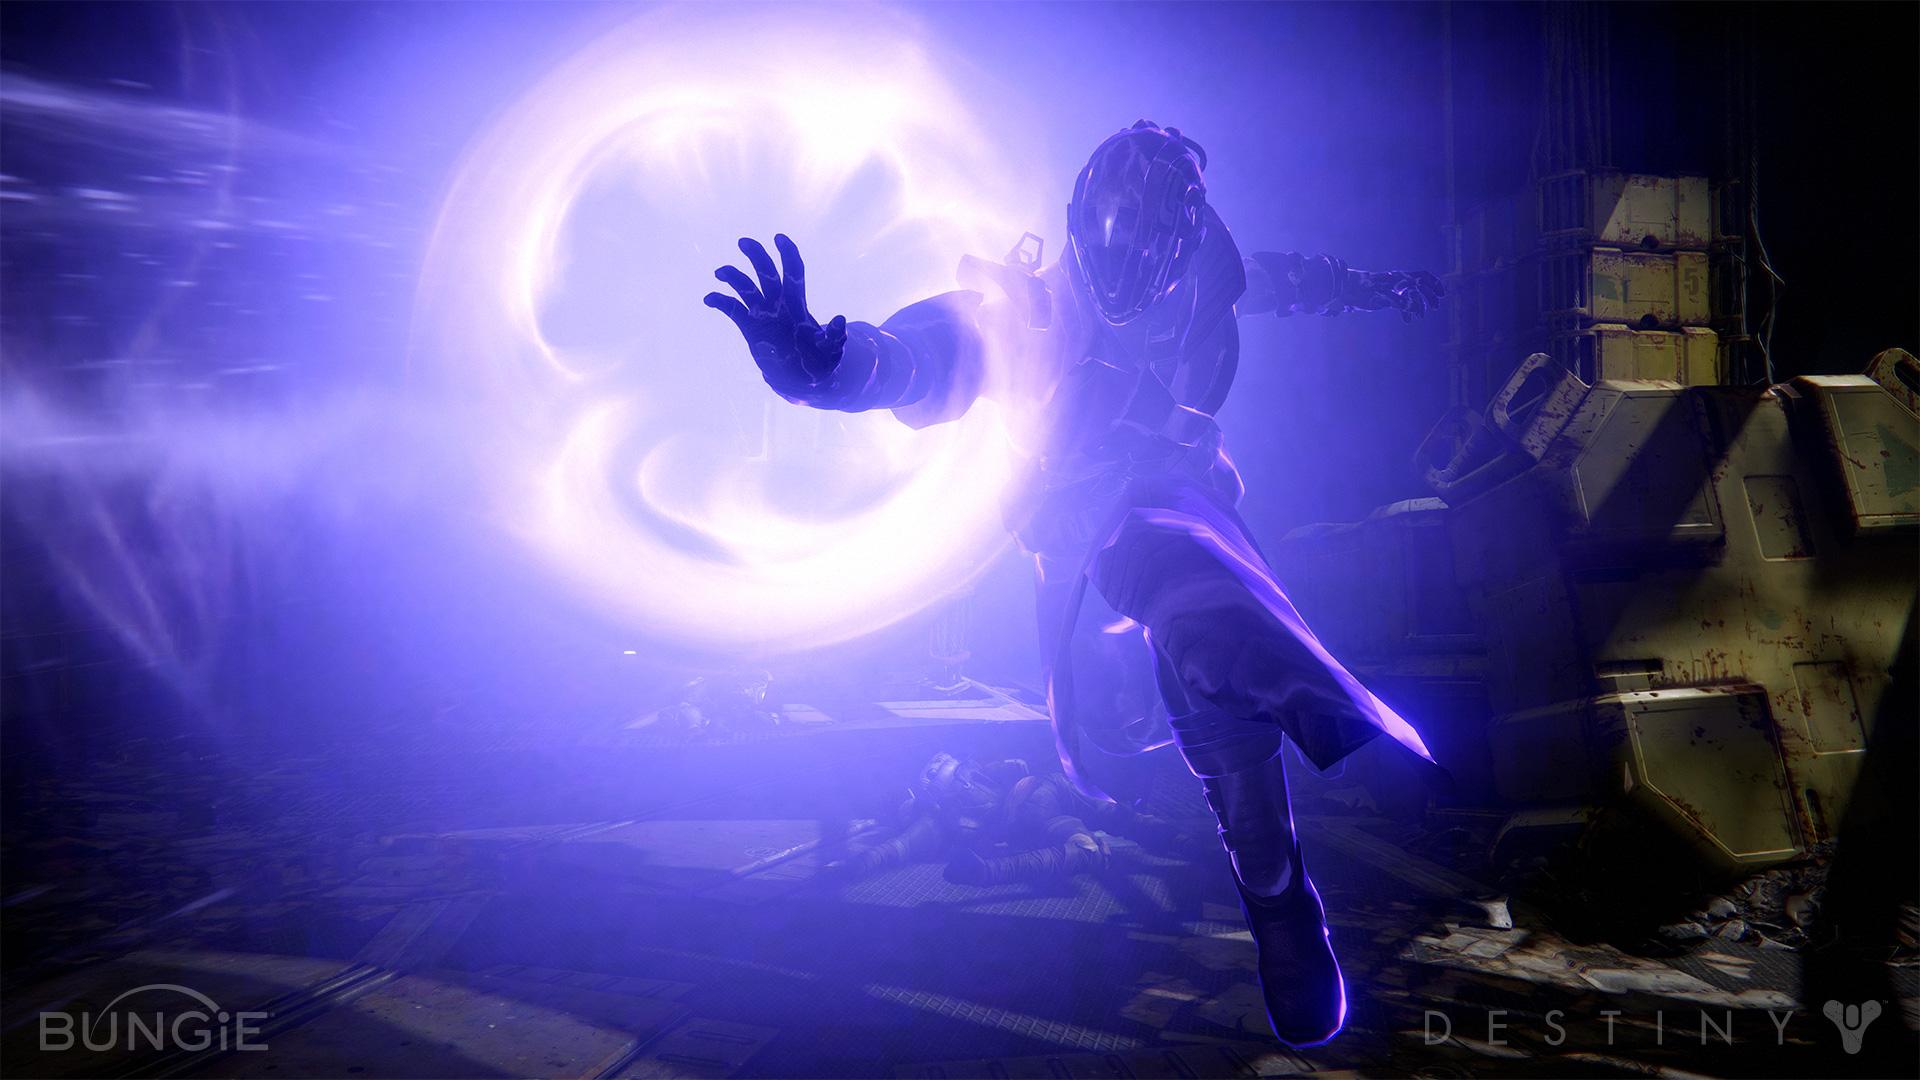 Destiny: Xur, Agent der Neun, Angebot und Position am 30.10.